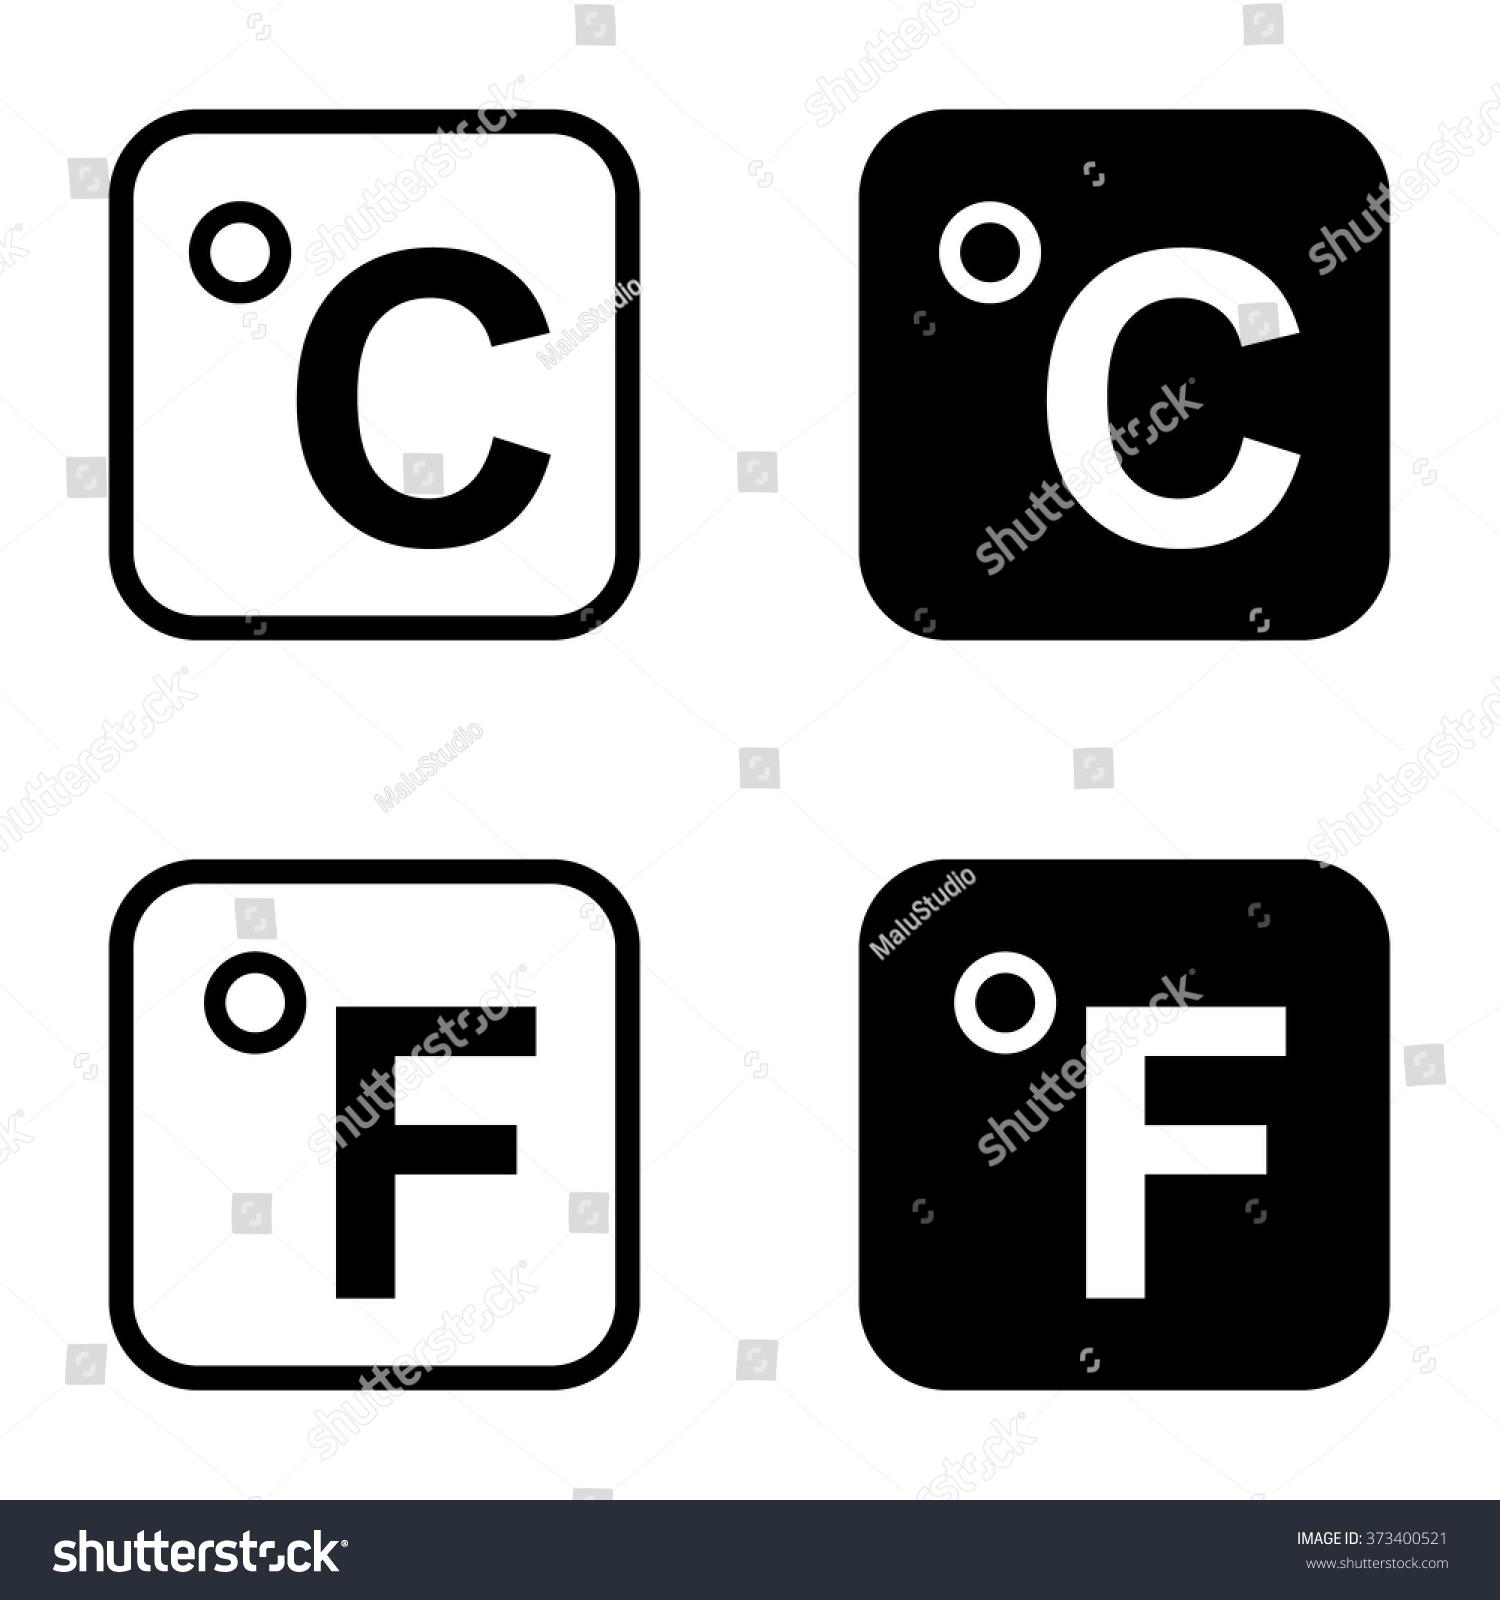 Celsius icon fahrenheit icon set vector stock vector 373400521 celsius icon and fahrenheit icon set vector illustration biocorpaavc Choice Image